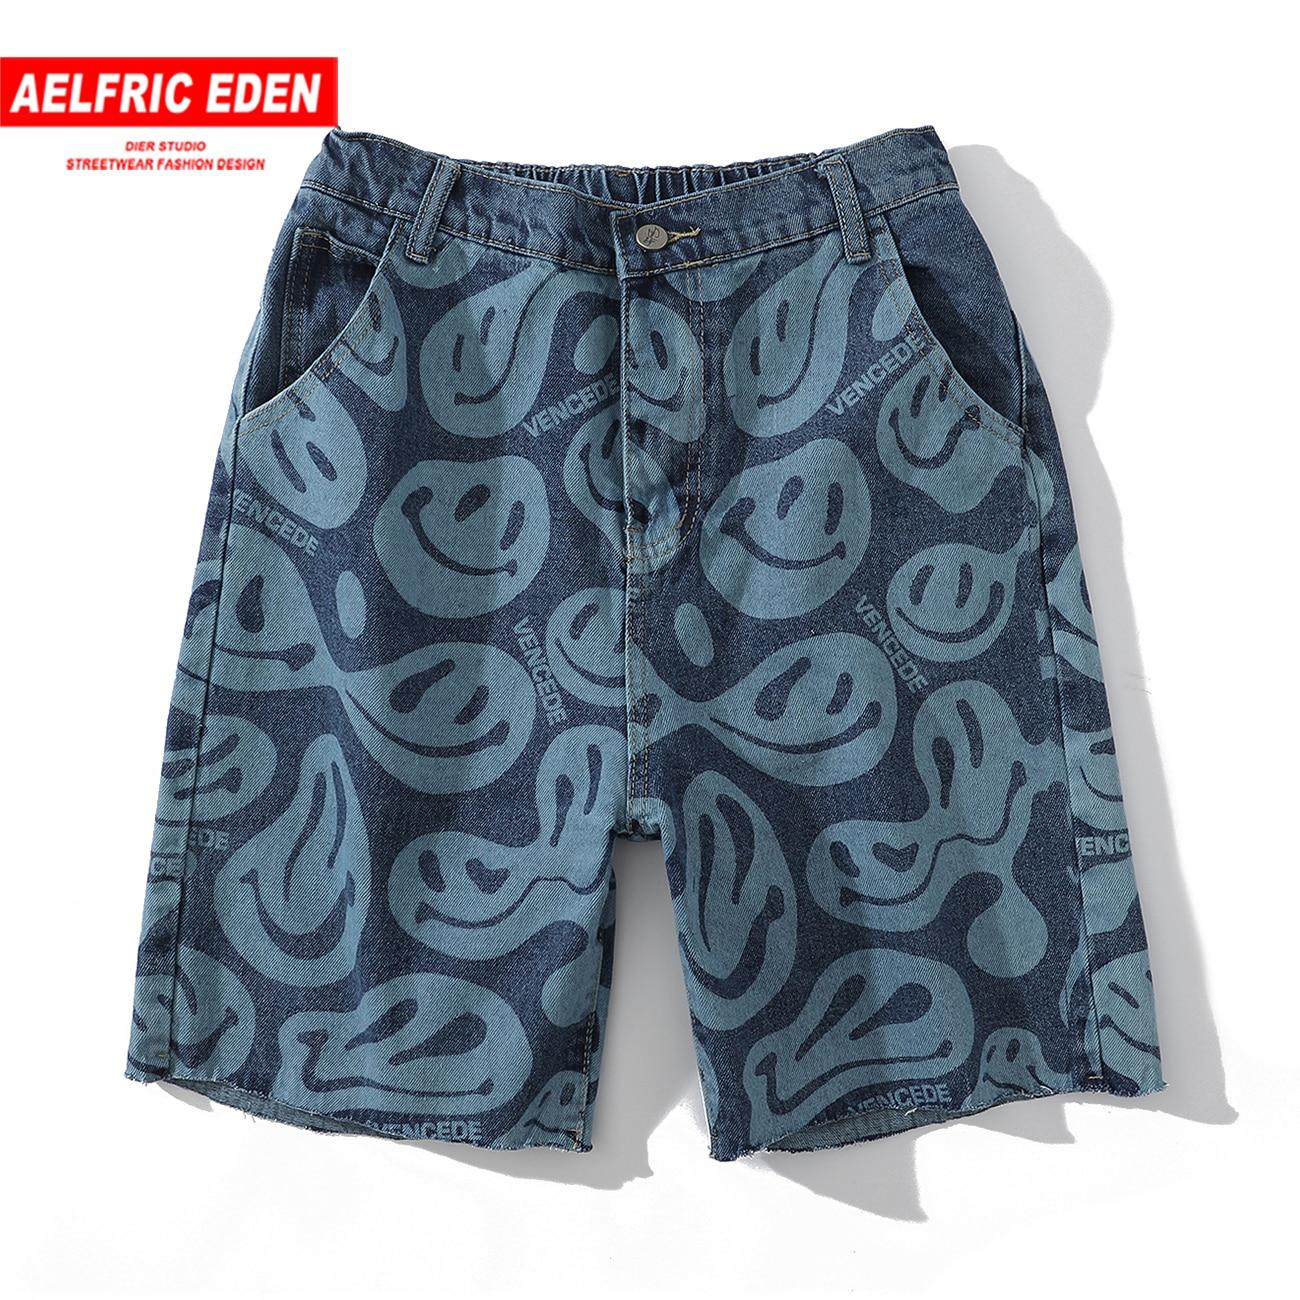 Aelfric Eden 2020 Summer Men Shorts Smile Print Hip Hop Casual Pants Streetwear Joggers Sweatpants Cotton Fashion Cargo Pants